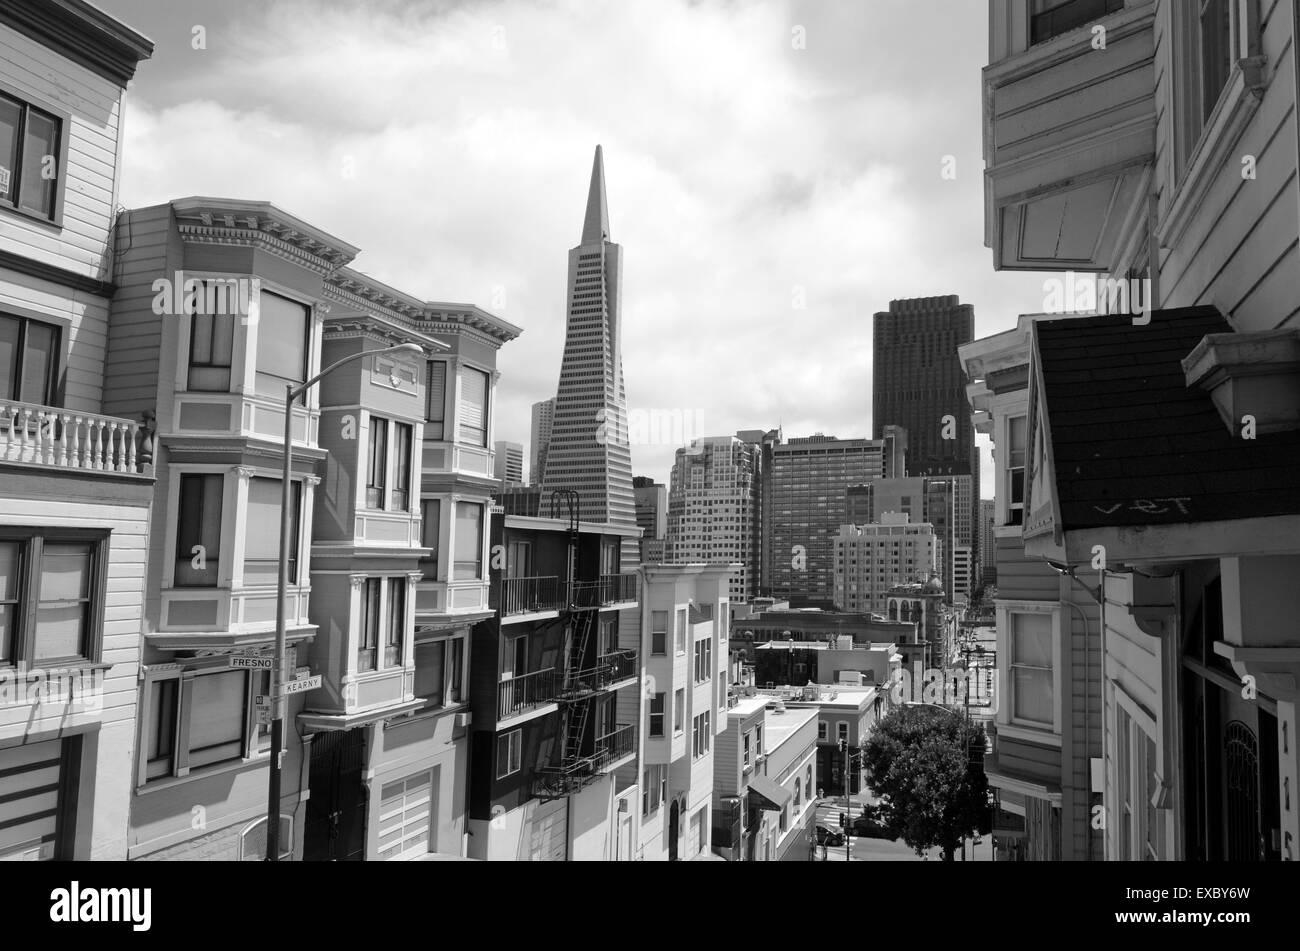 SAN FRANCISCO - MAY 18 2015: Transamerica Pyramid in San Francisco CBD. At 853 feet (250 meter) tall the Transamerica - Stock Image